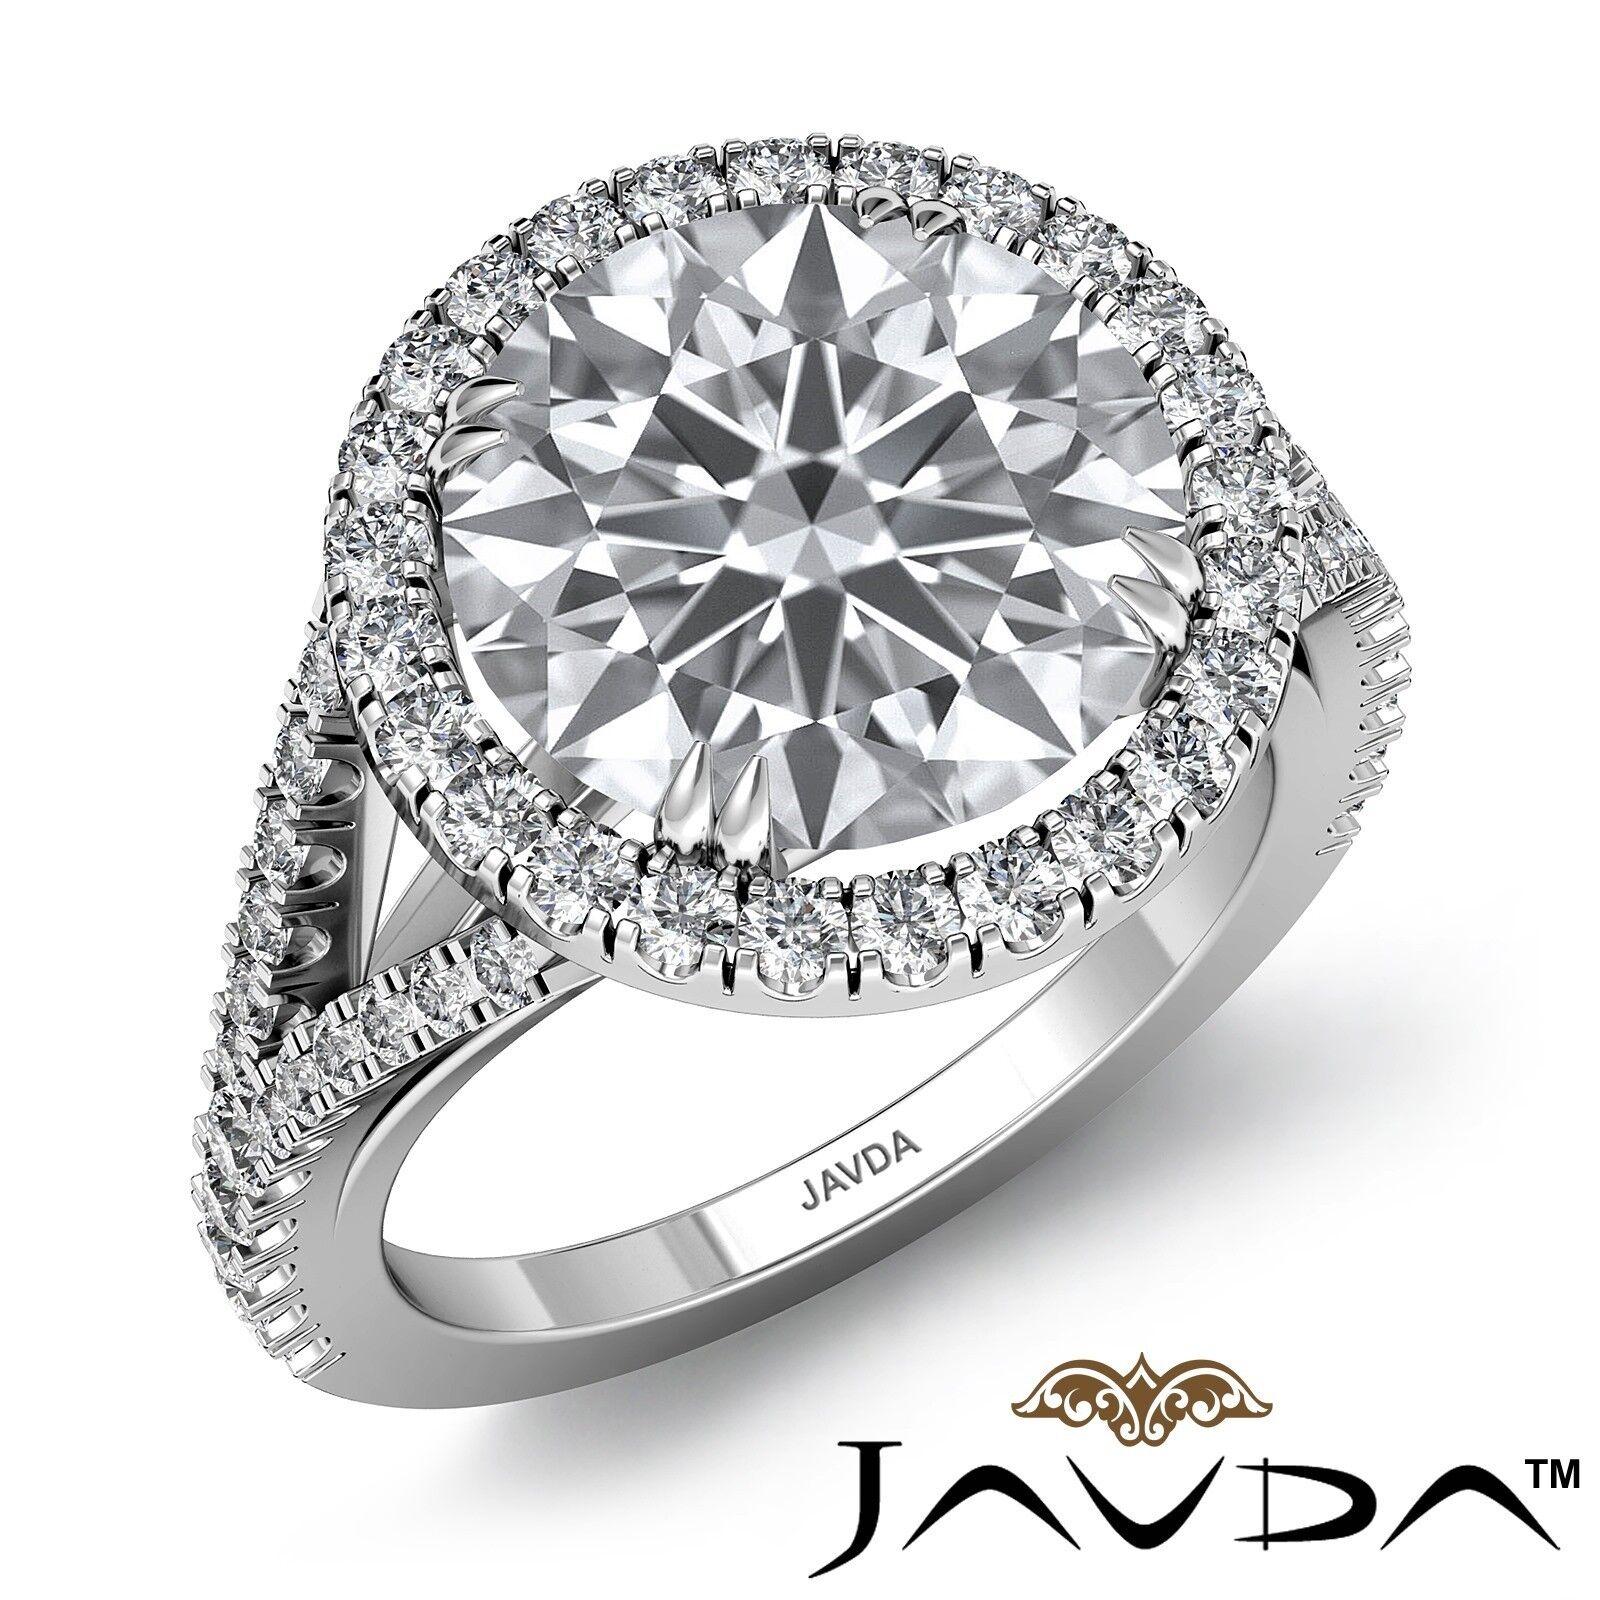 3.75ctw Heavy Design Round Diamond Engagement Ring GIA F-VS2 Platinum Women New